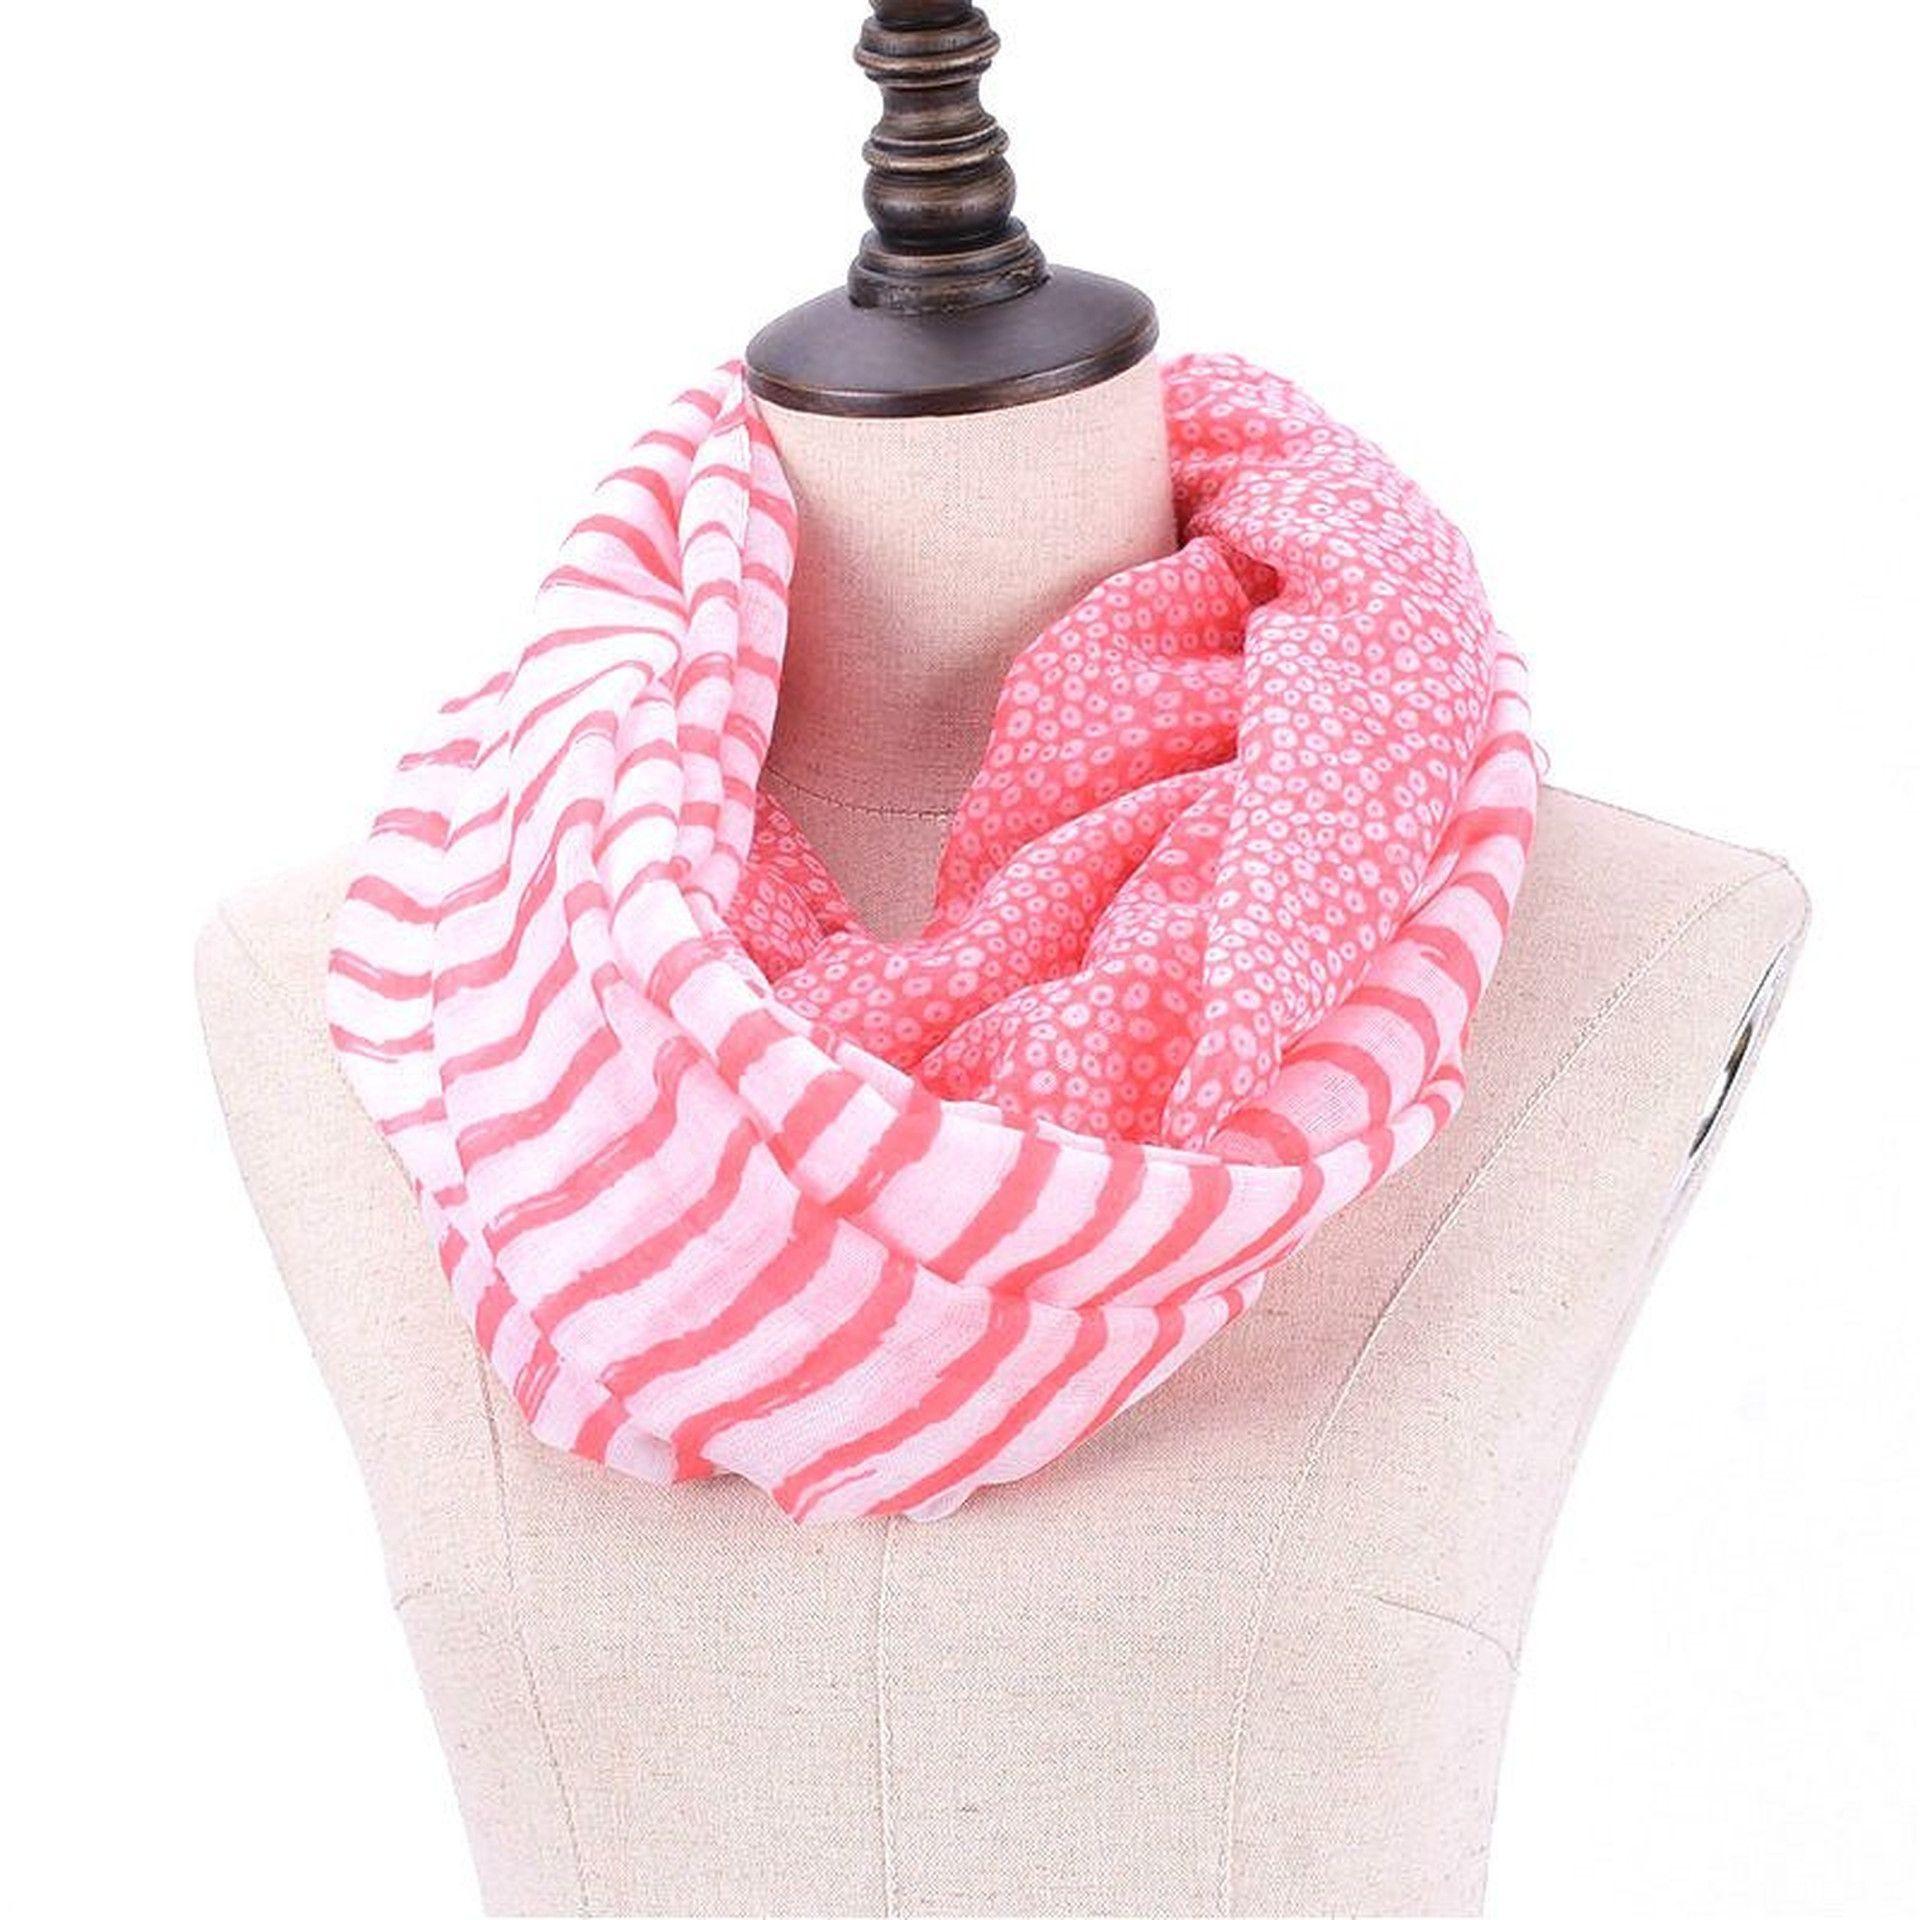 sbrs htm sheer p buffalo infinity sabres product scarf